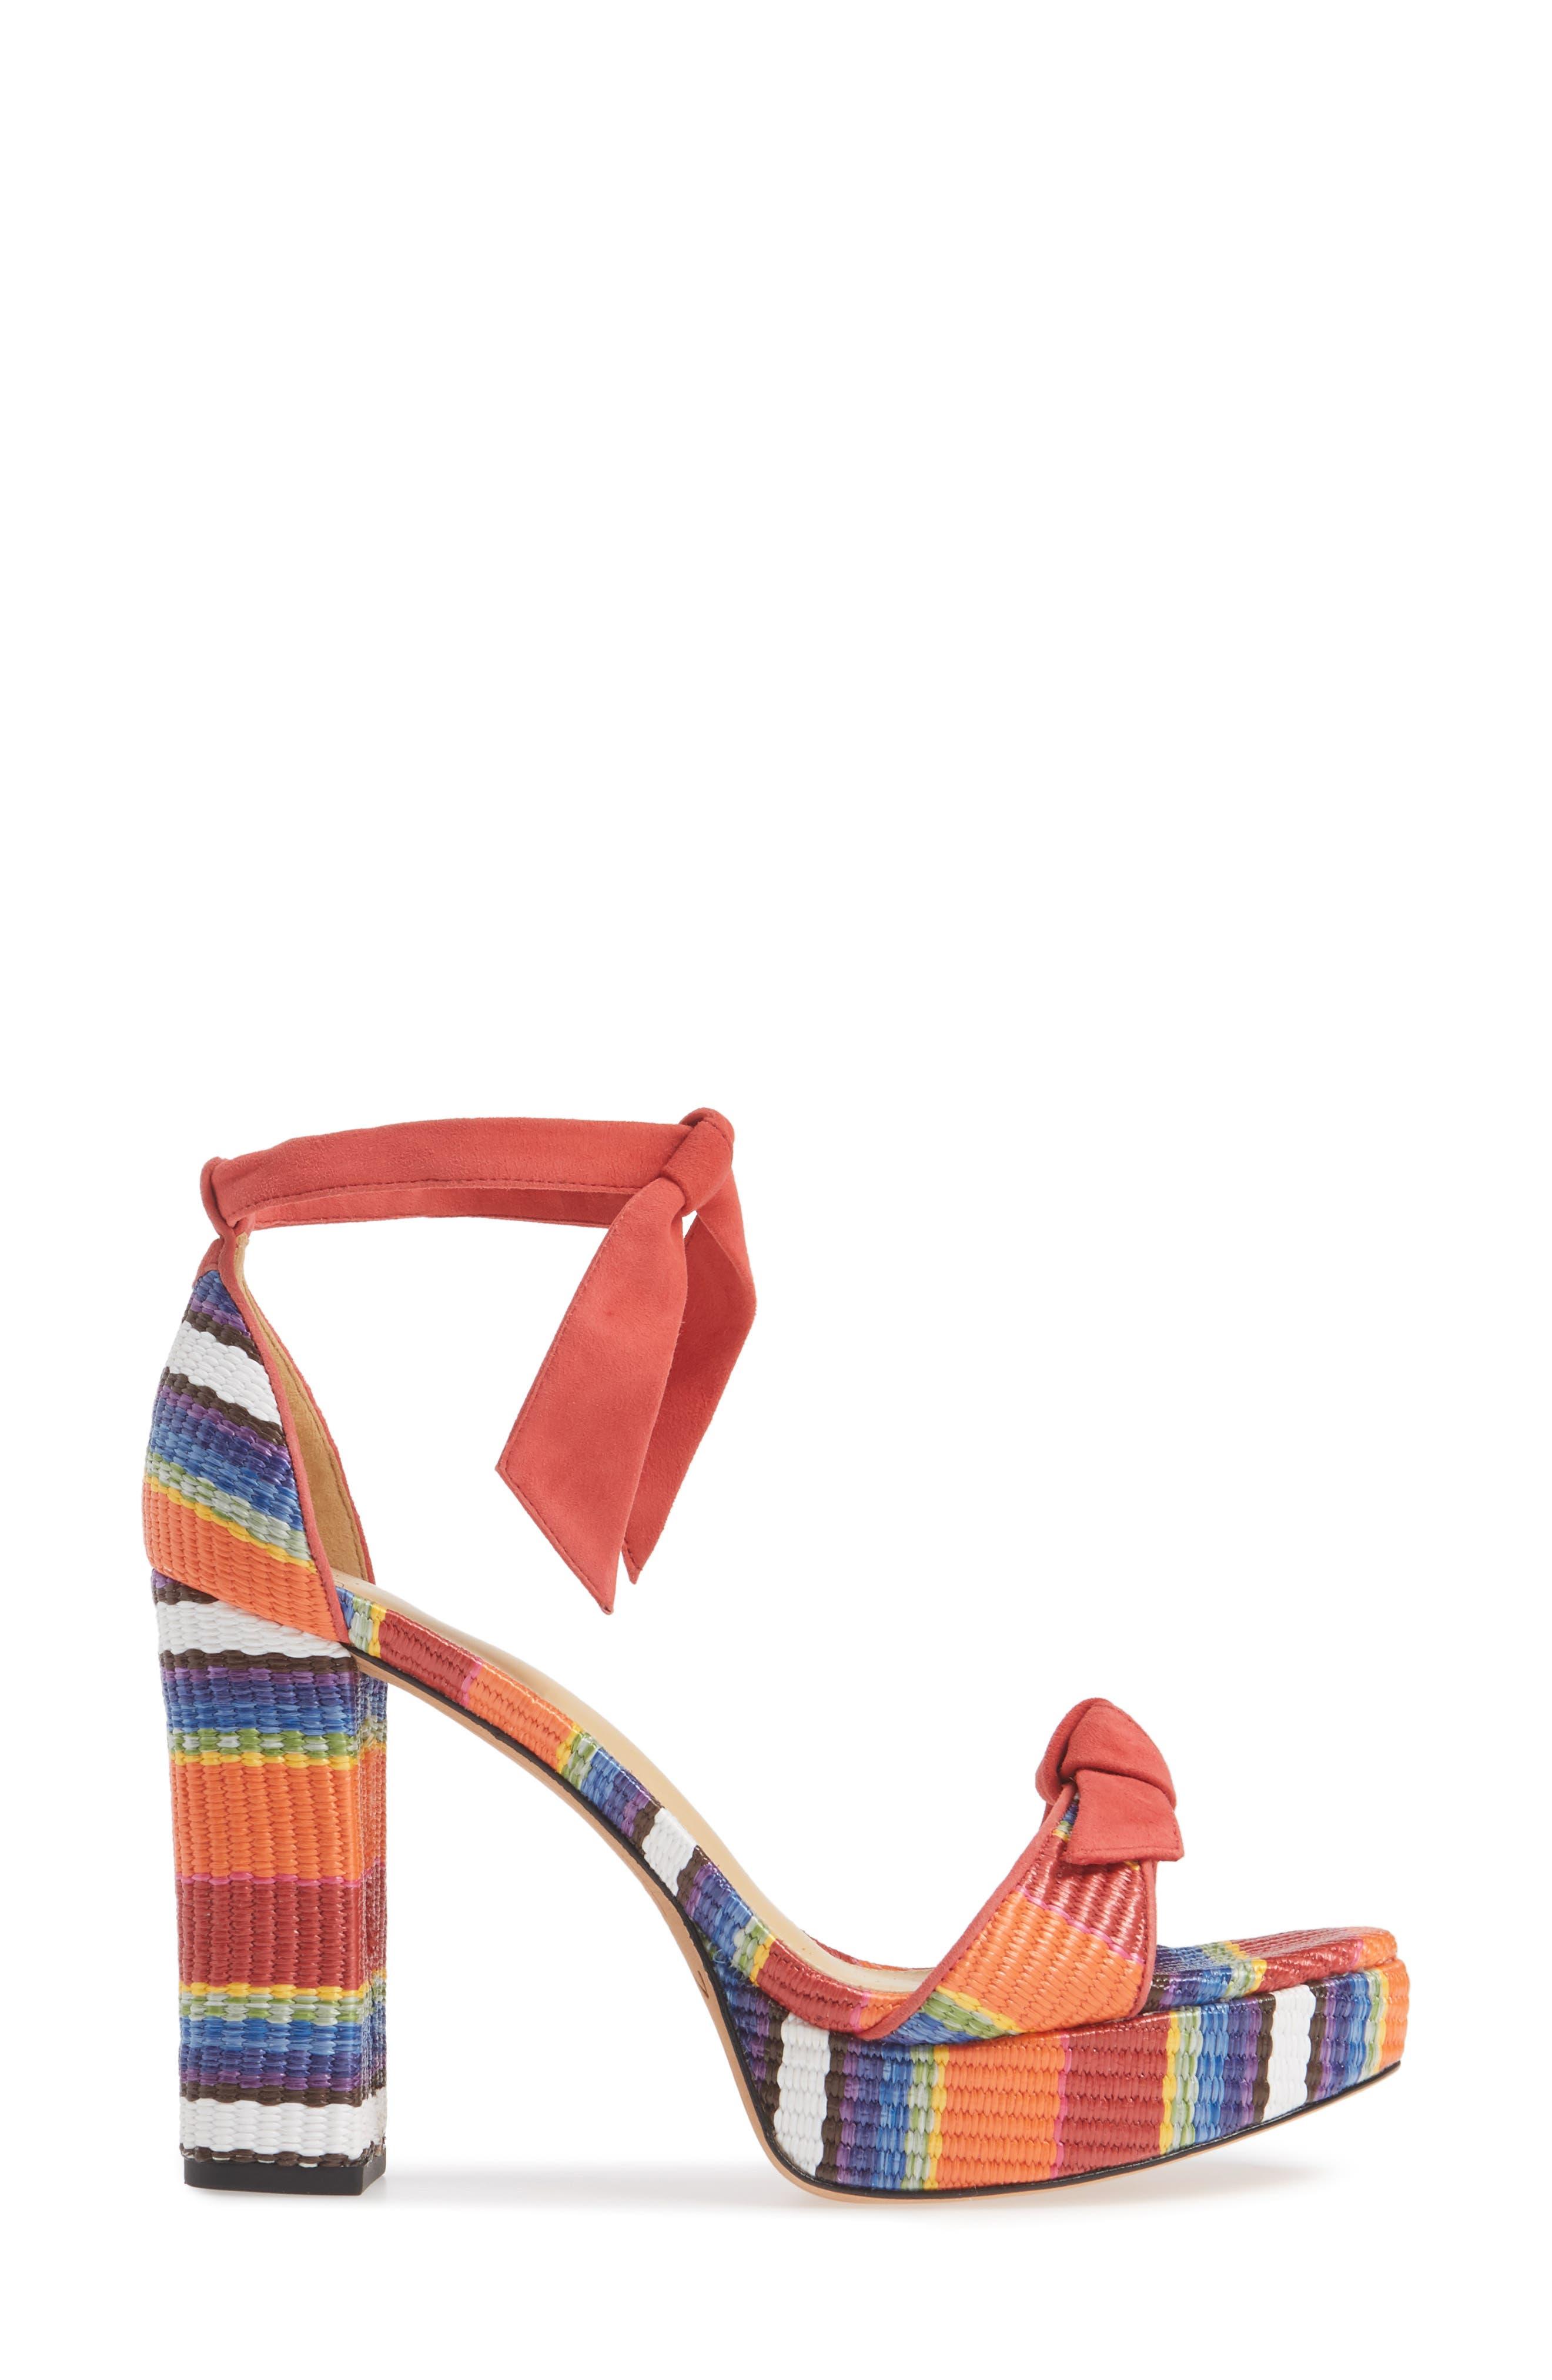 ALEXANDRE BIRMAN, Clarita Platform Sandal, Alternate thumbnail 3, color, CORAL MULTI